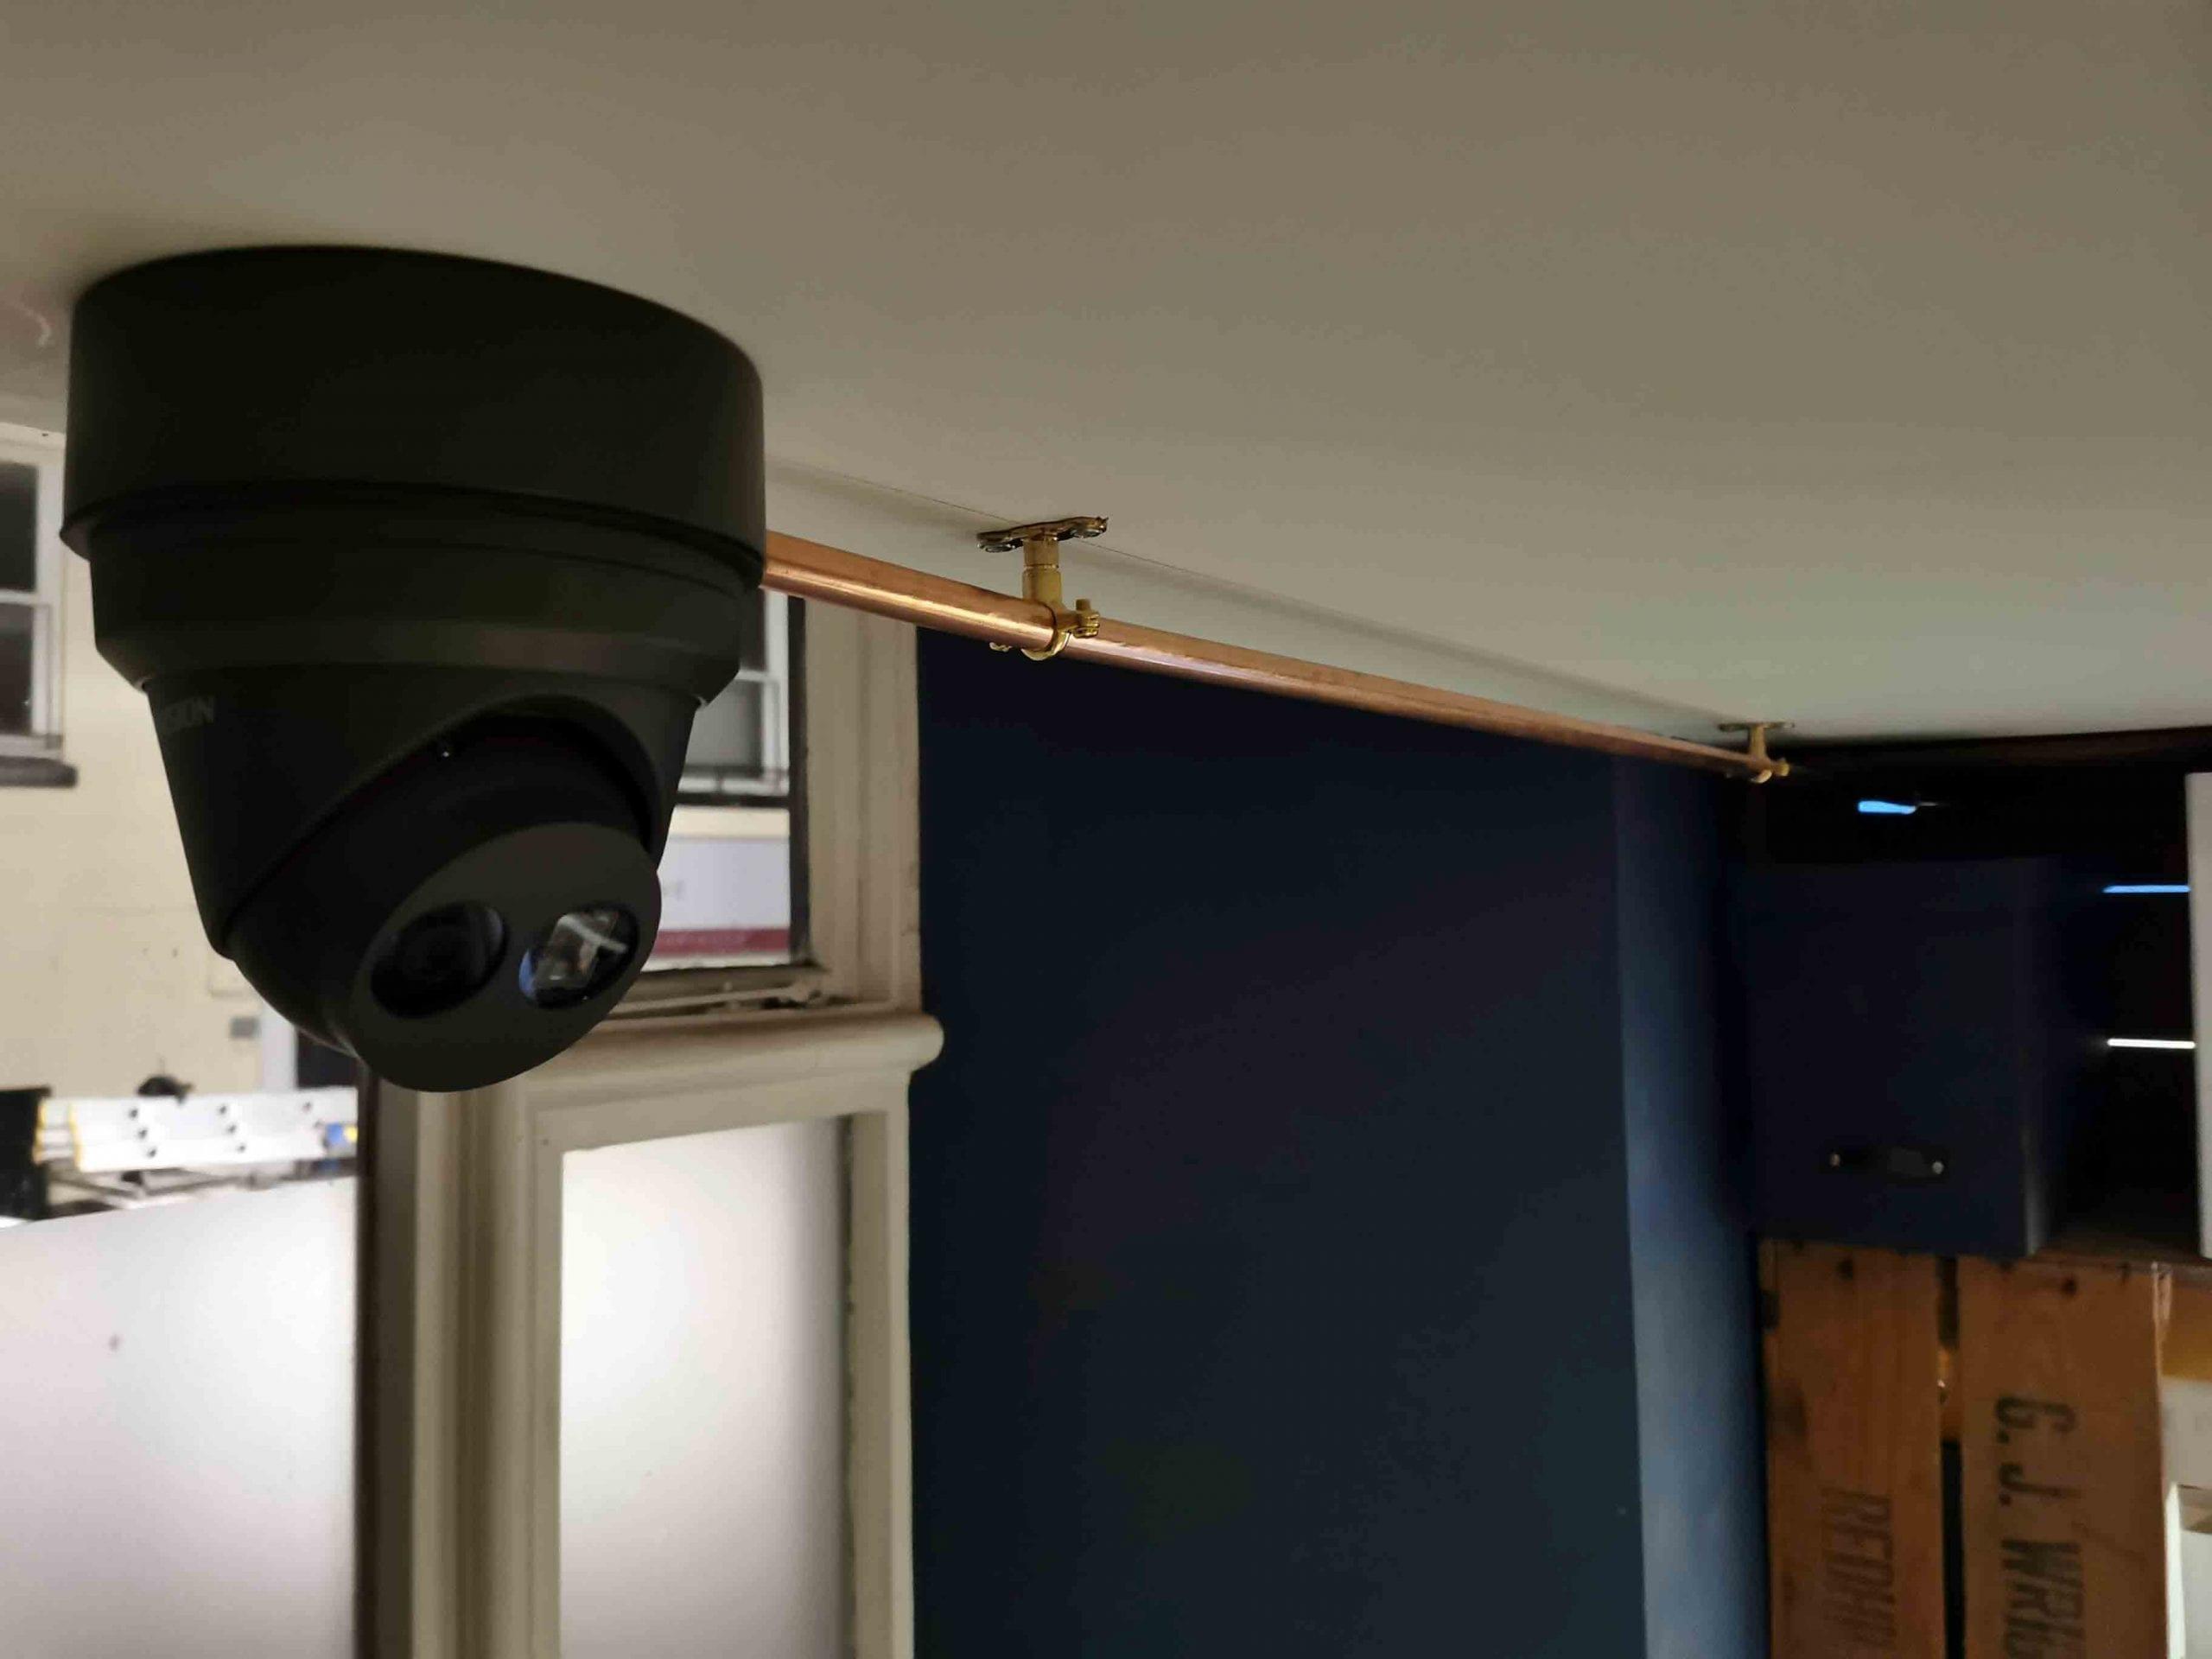 HIKVision turret style CCTV camera